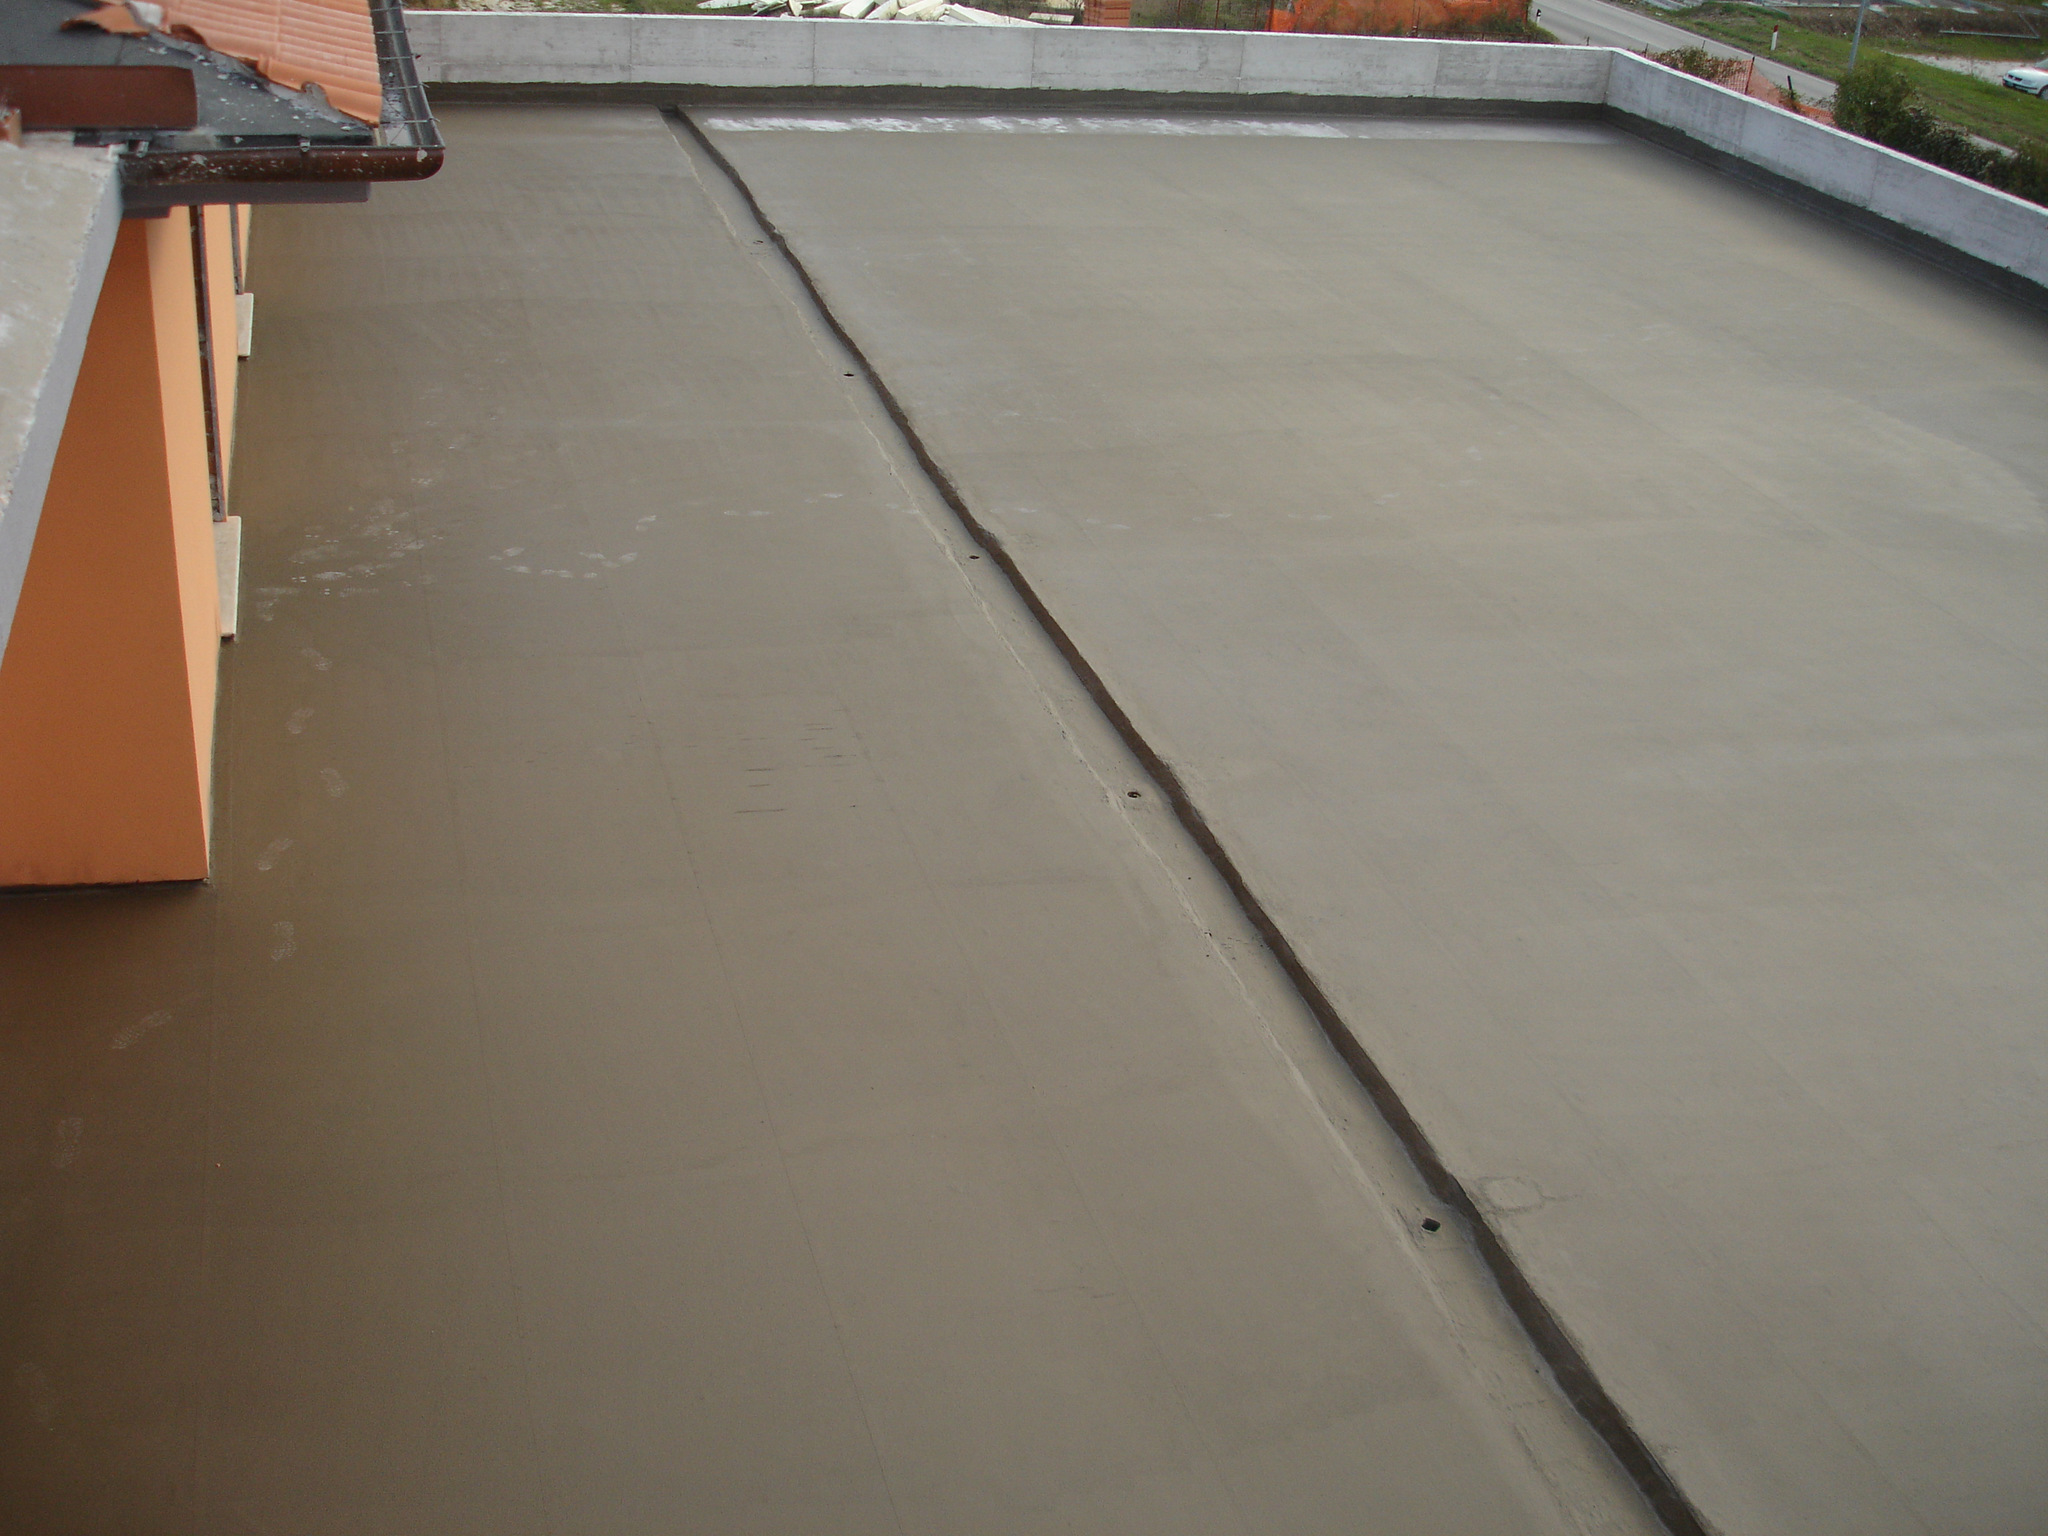 C mo aplicar cemento el stico para impermeabilizar - Impermeabilizantes para terrazas ...